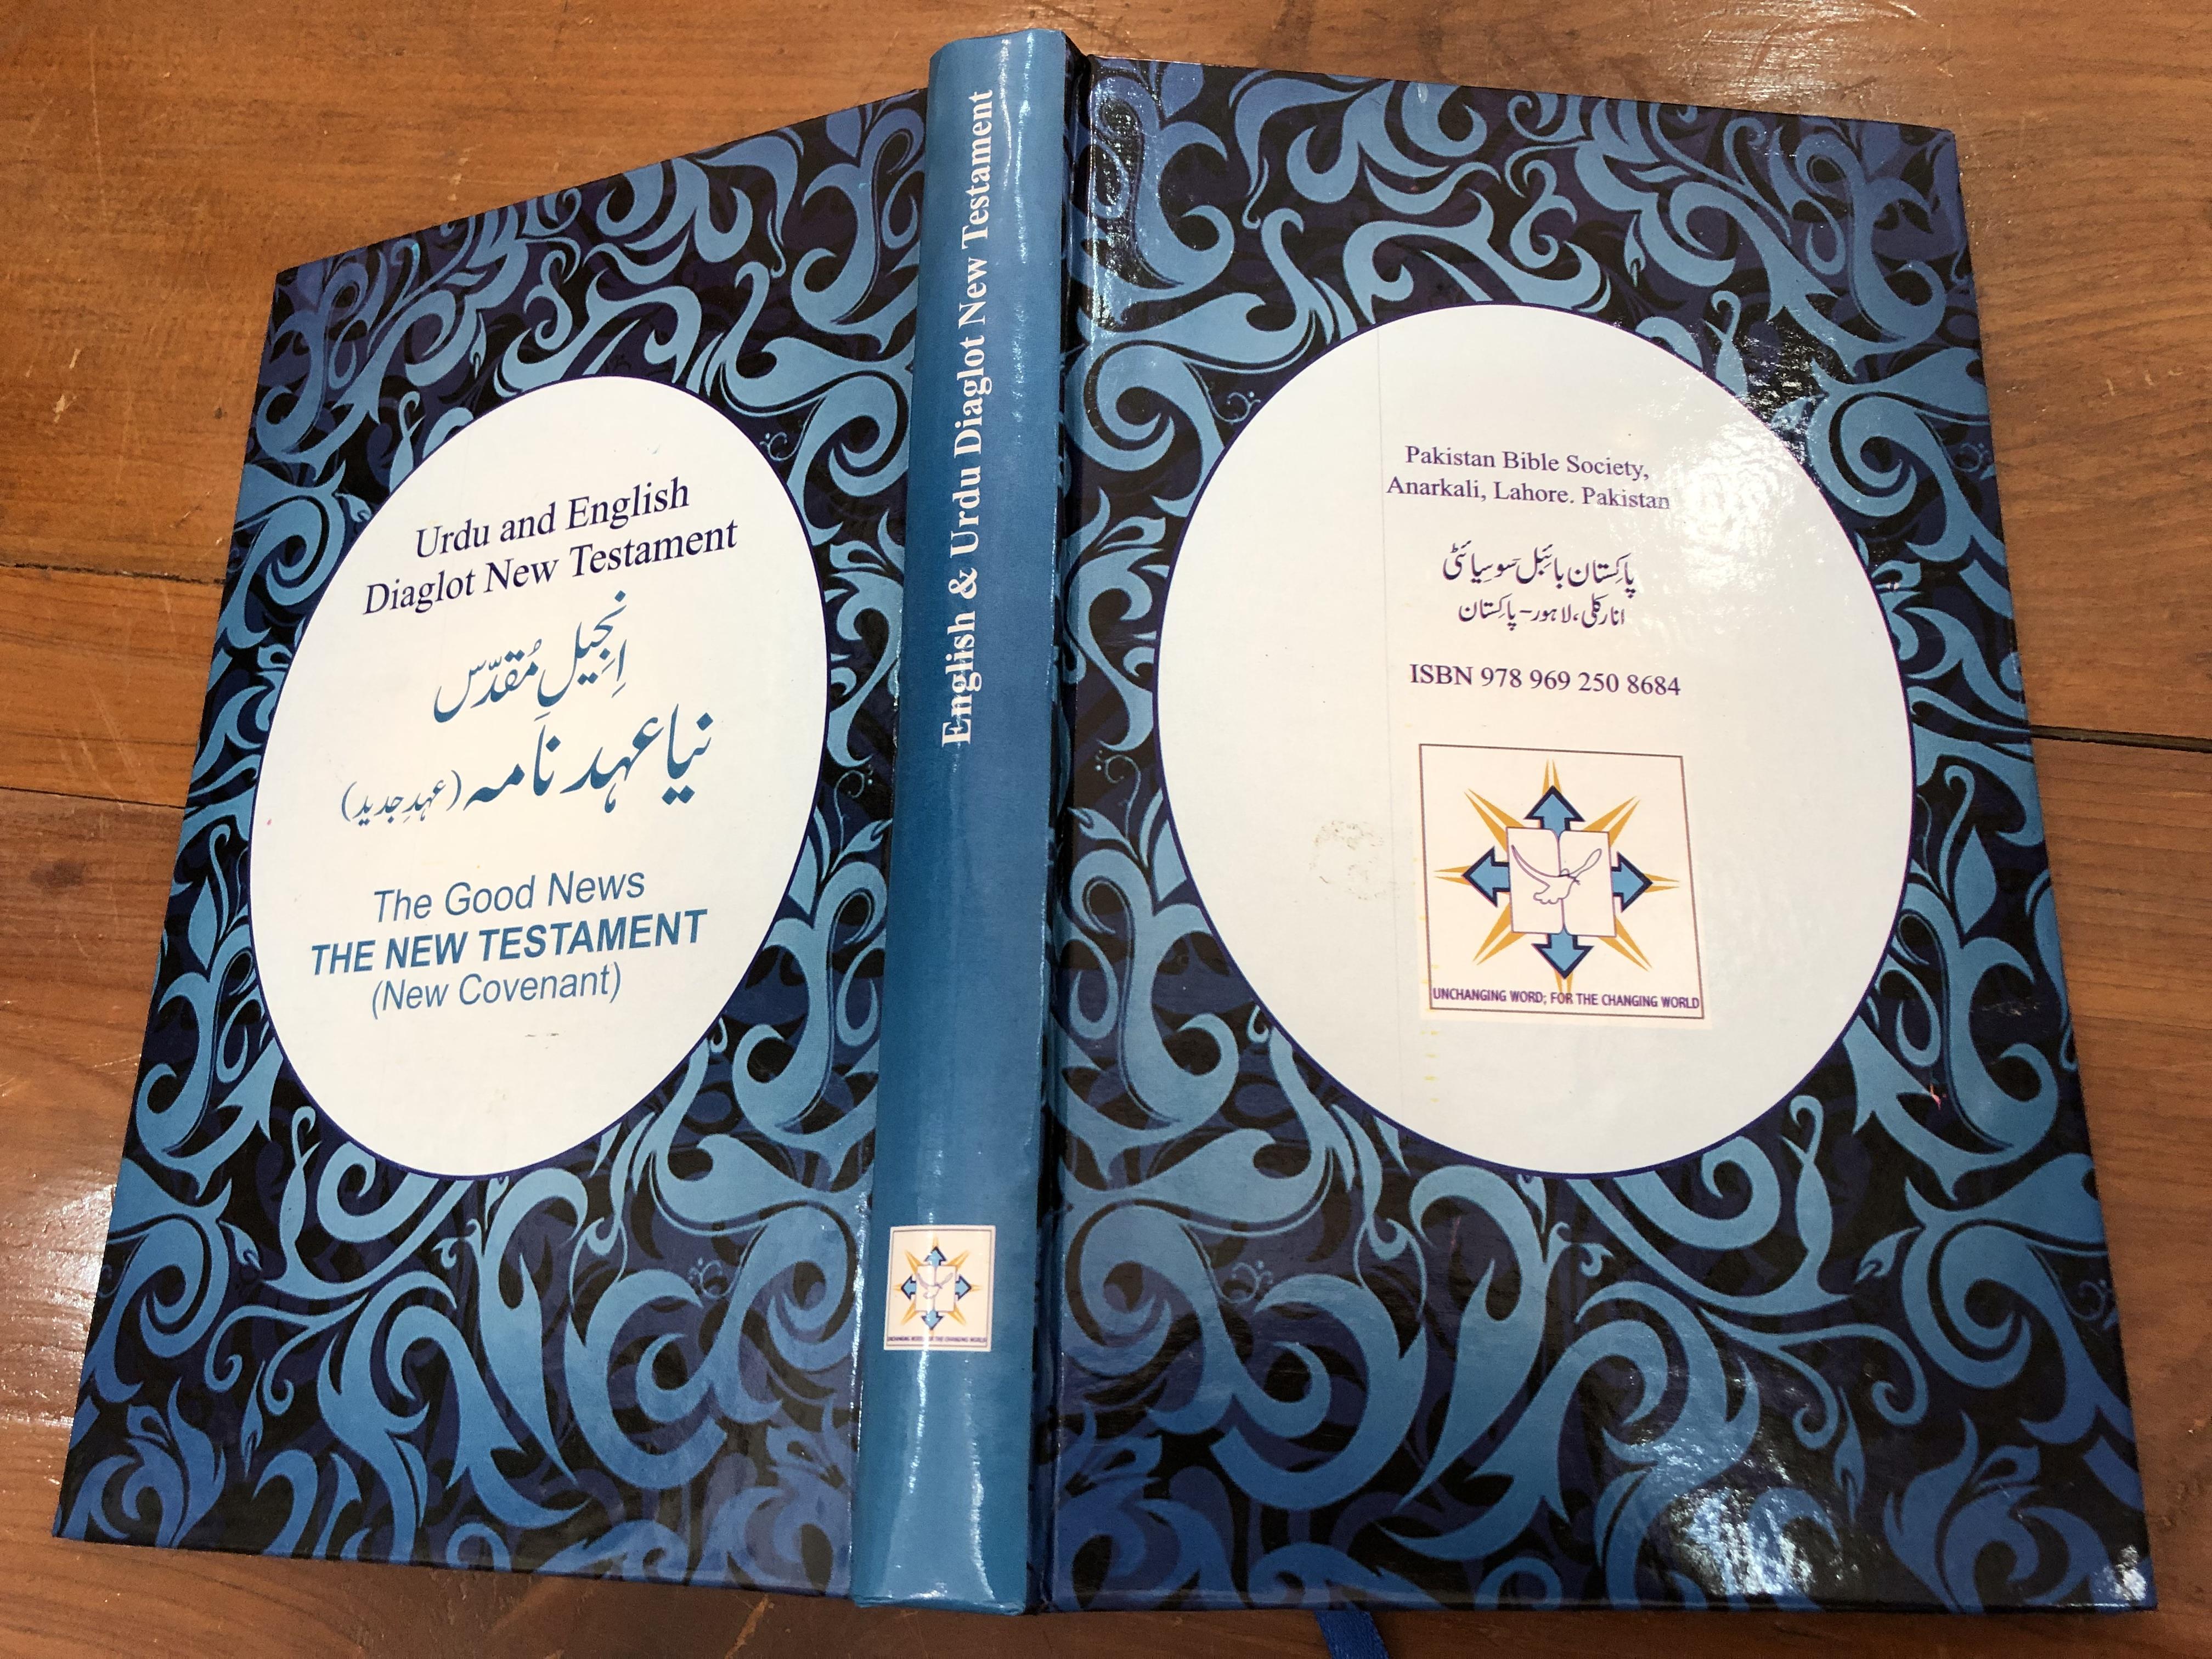 urdu-english-new-testament-the-good-news-the-new-covenant-english-urdu-diaglot-bilingual-new-testament-parallel-text-3-.jpg